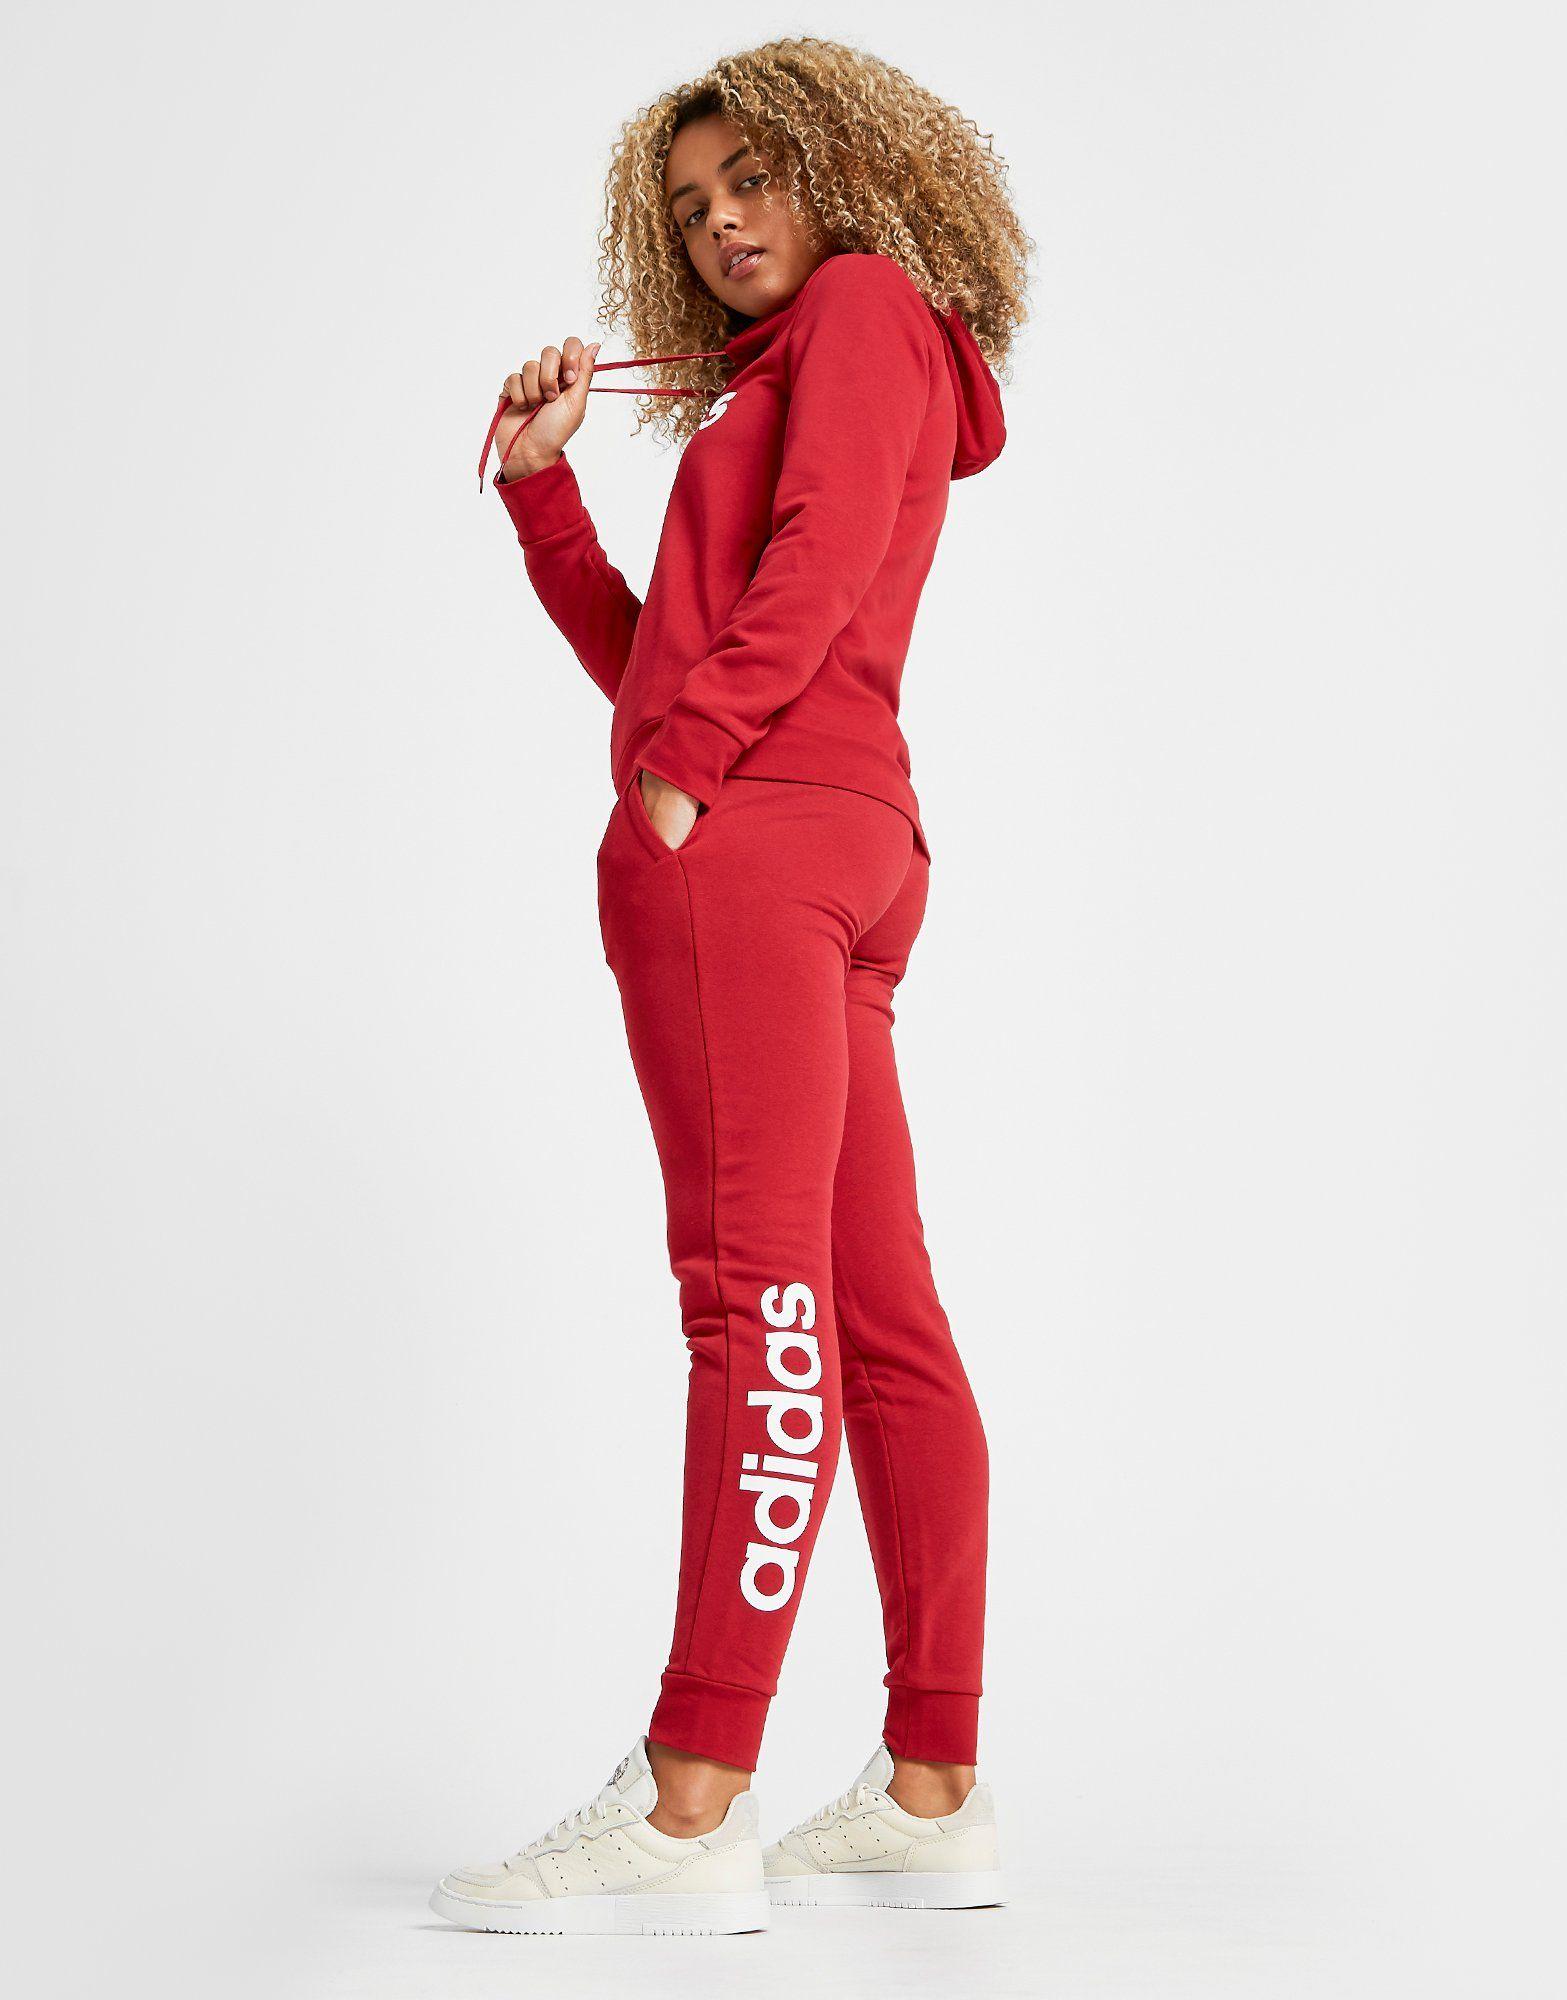 Adidas Adidas Sports Jogging FemmeJd Core Adidas Sports Core FemmeJd Jogging Jogging POXkiuwZT